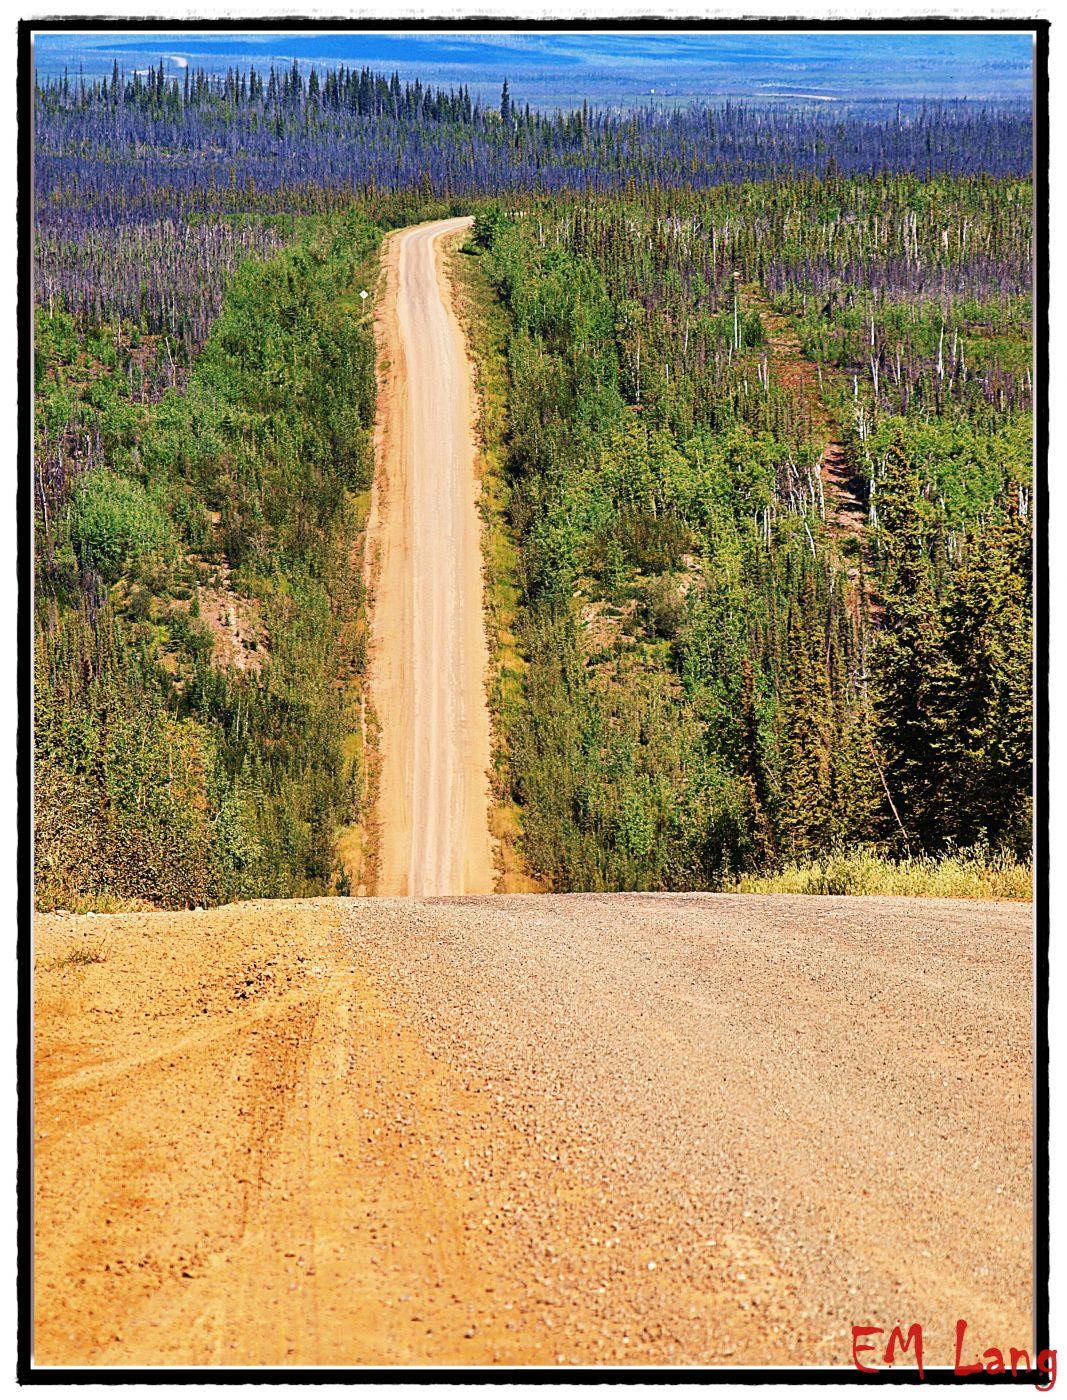 Alaska  Dalton Highway Wilderness Roadtrip, USA